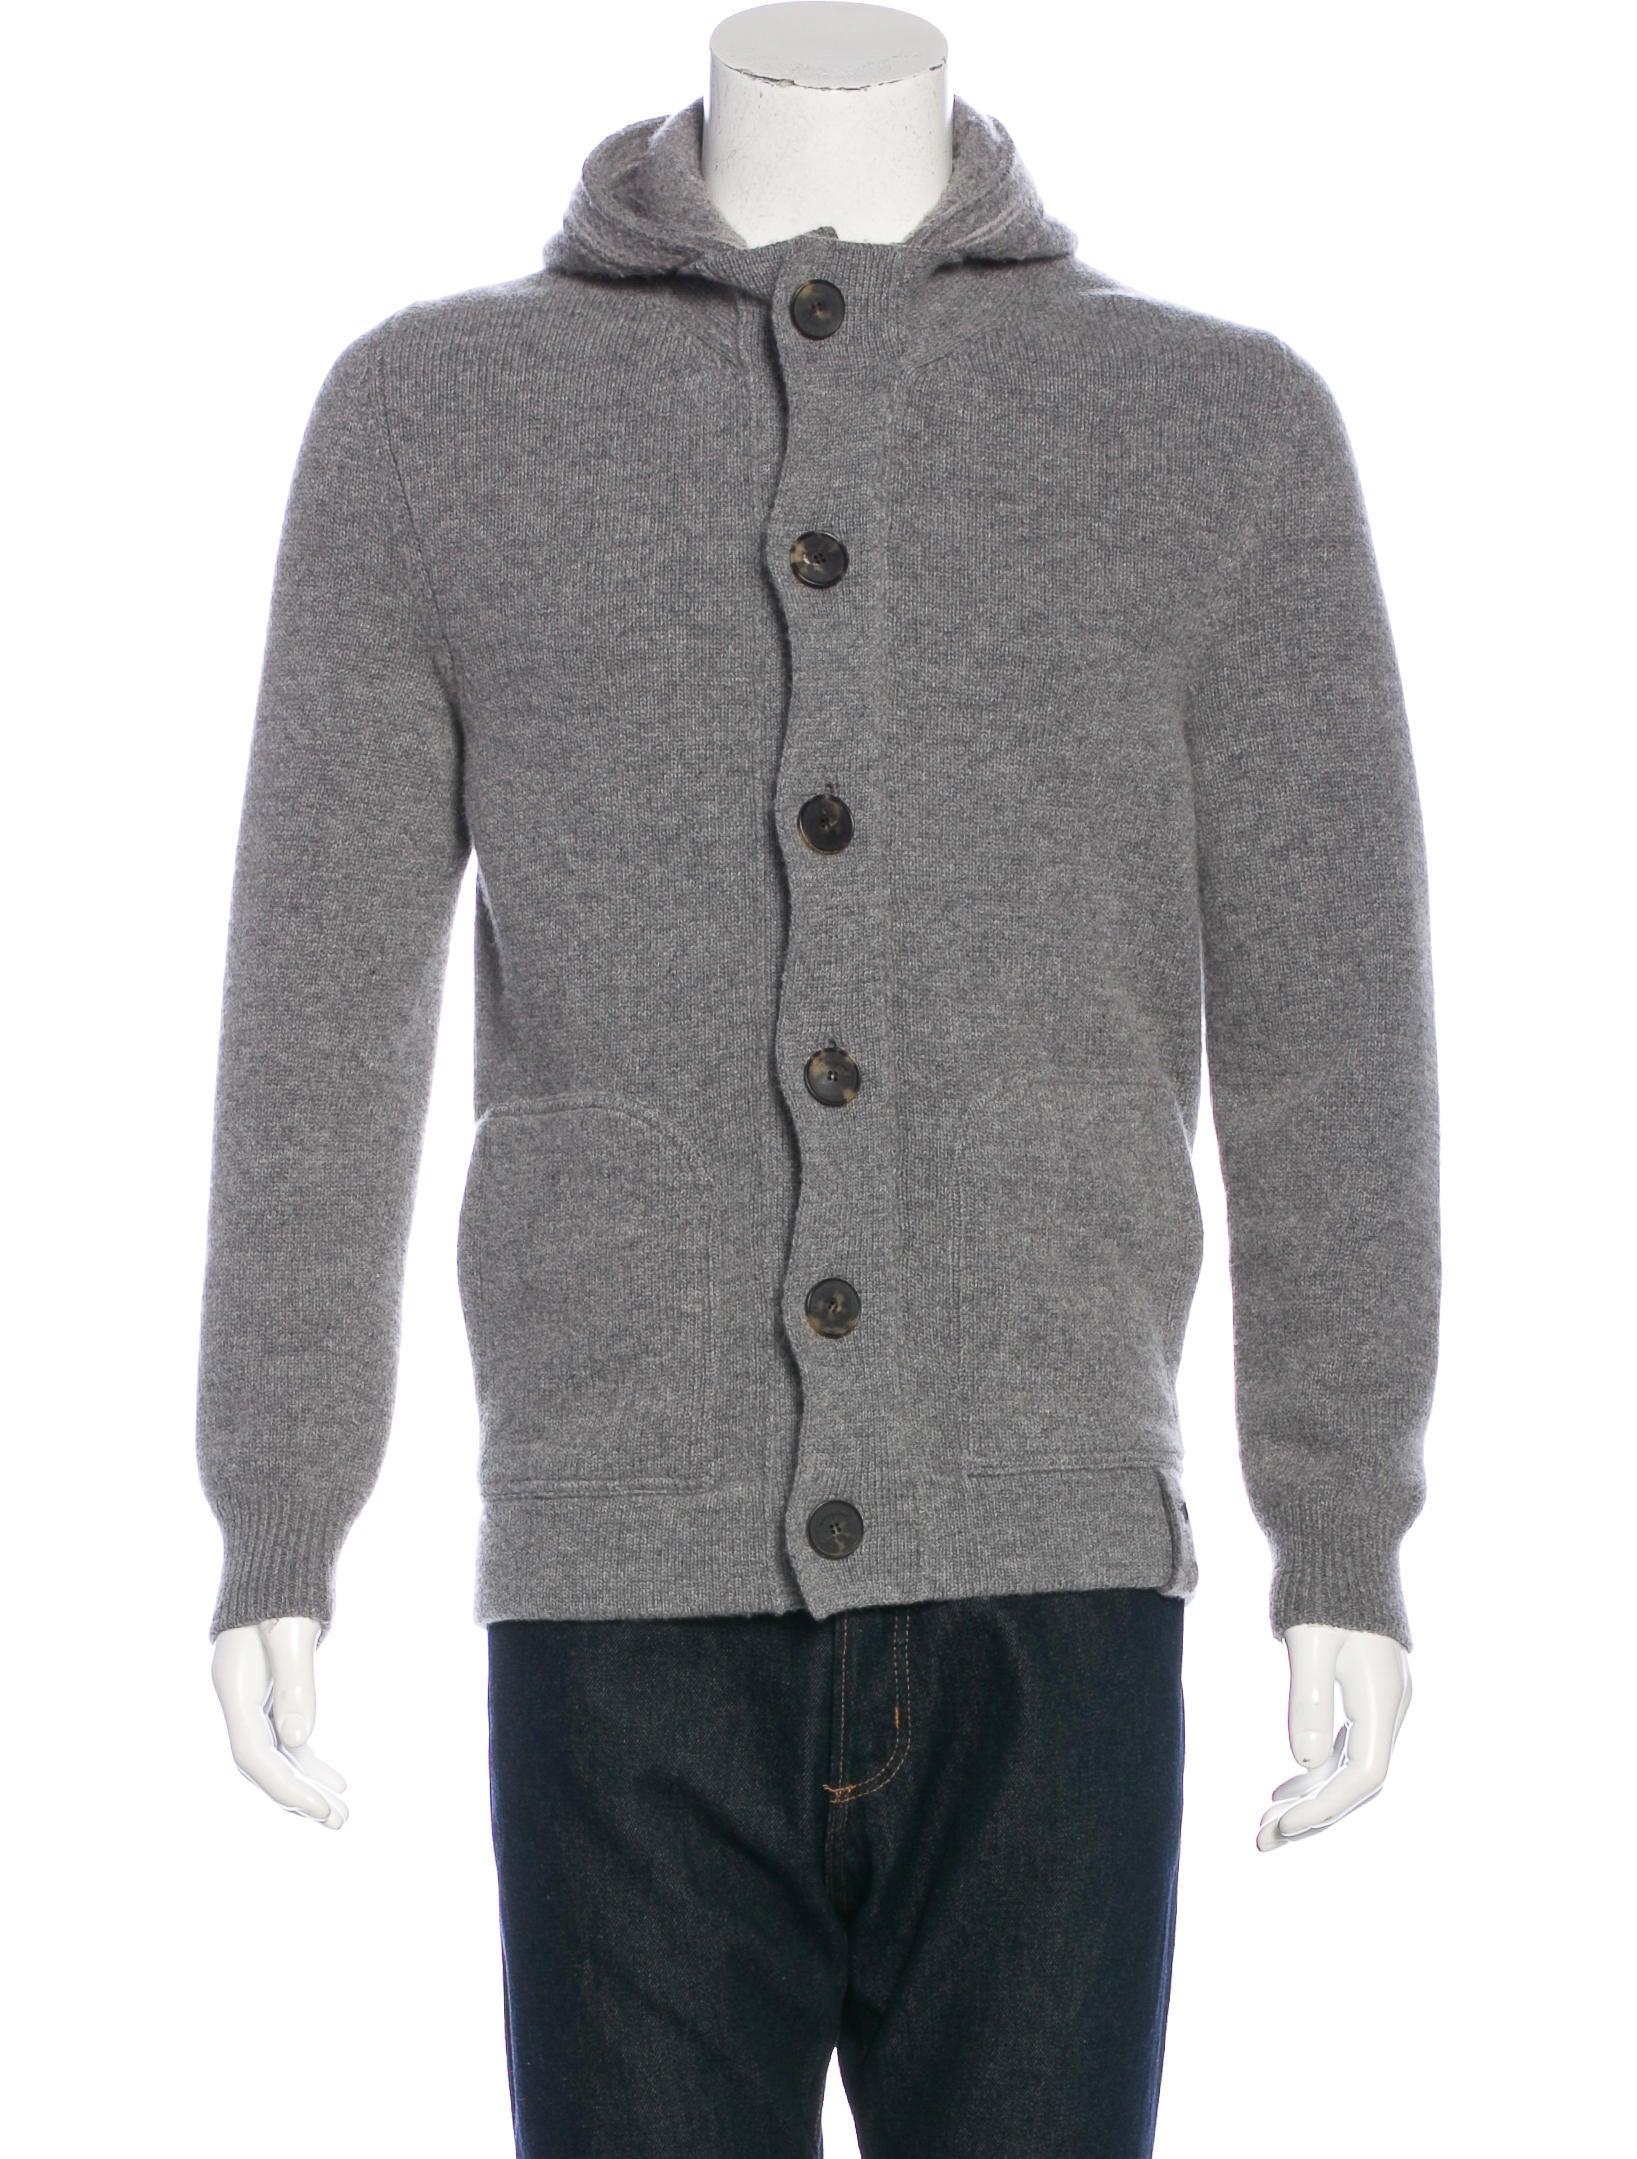 Salvatore Ferragamo Hooded Wool Cardigan - Clothing - SAL47364 ...